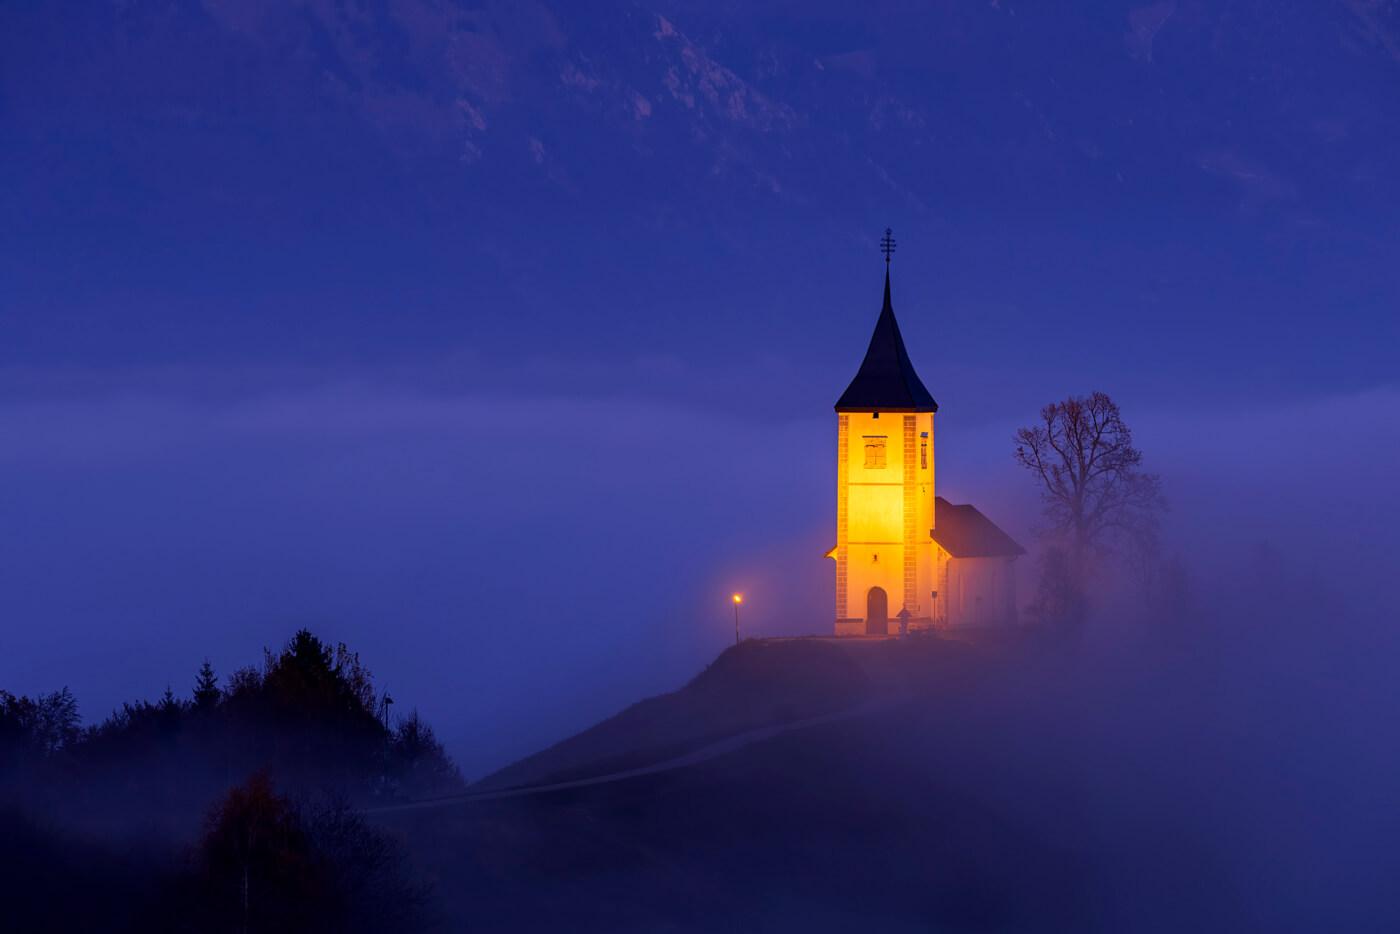 St Primus Church, Jamnik, Slovenia